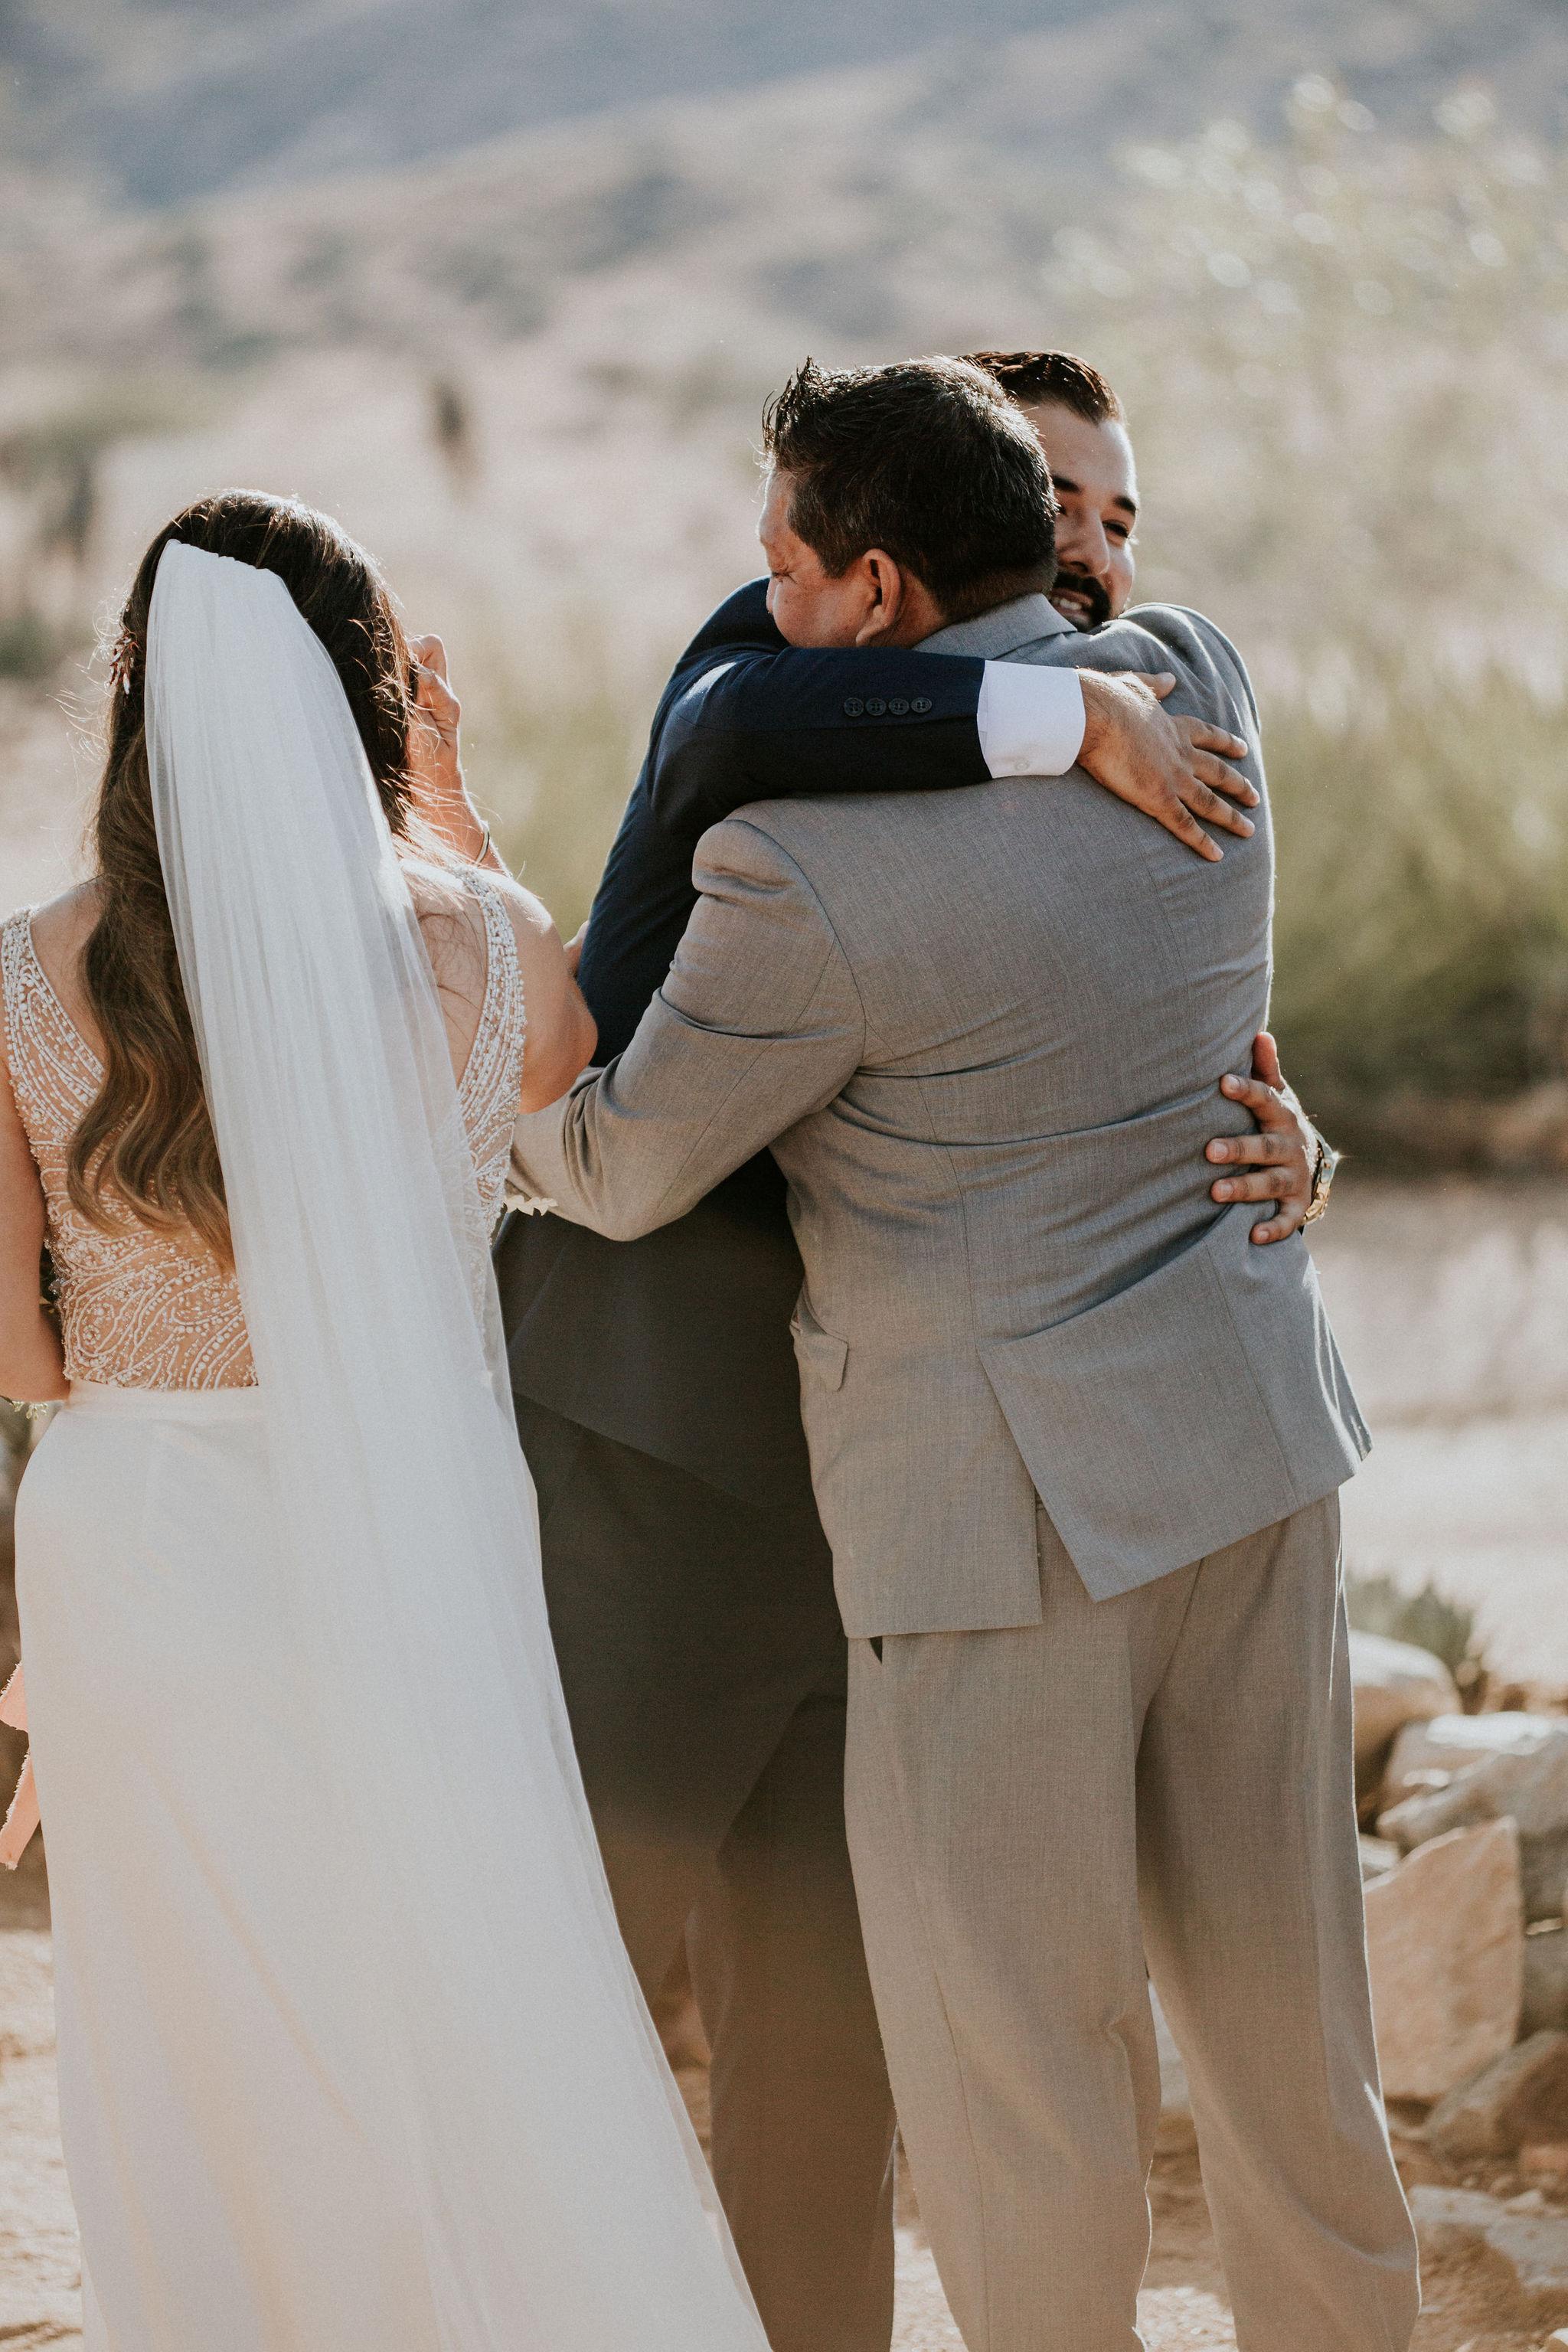 RimrockRanch-JoshuaTree-Wedding-Jami-Laree-309.jpg